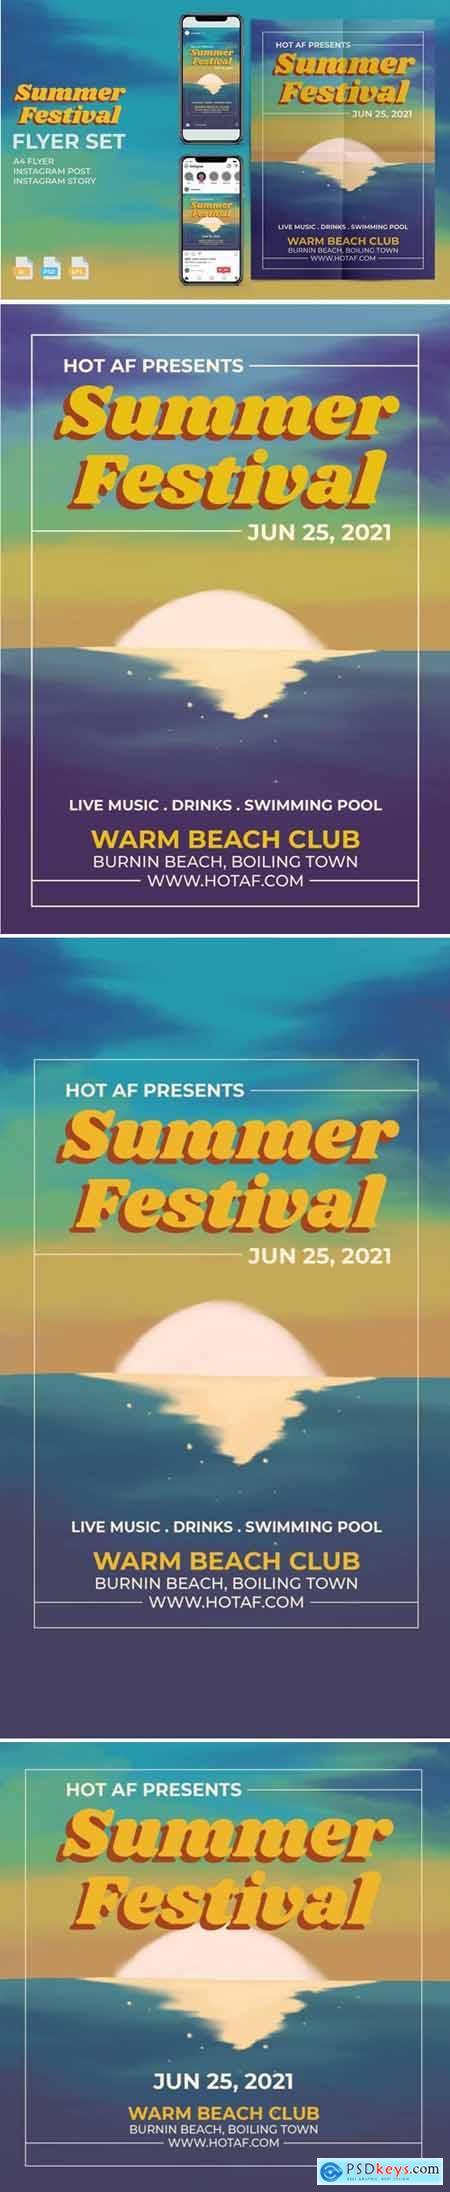 Summer Festival Flyer Set - Print and Social Media